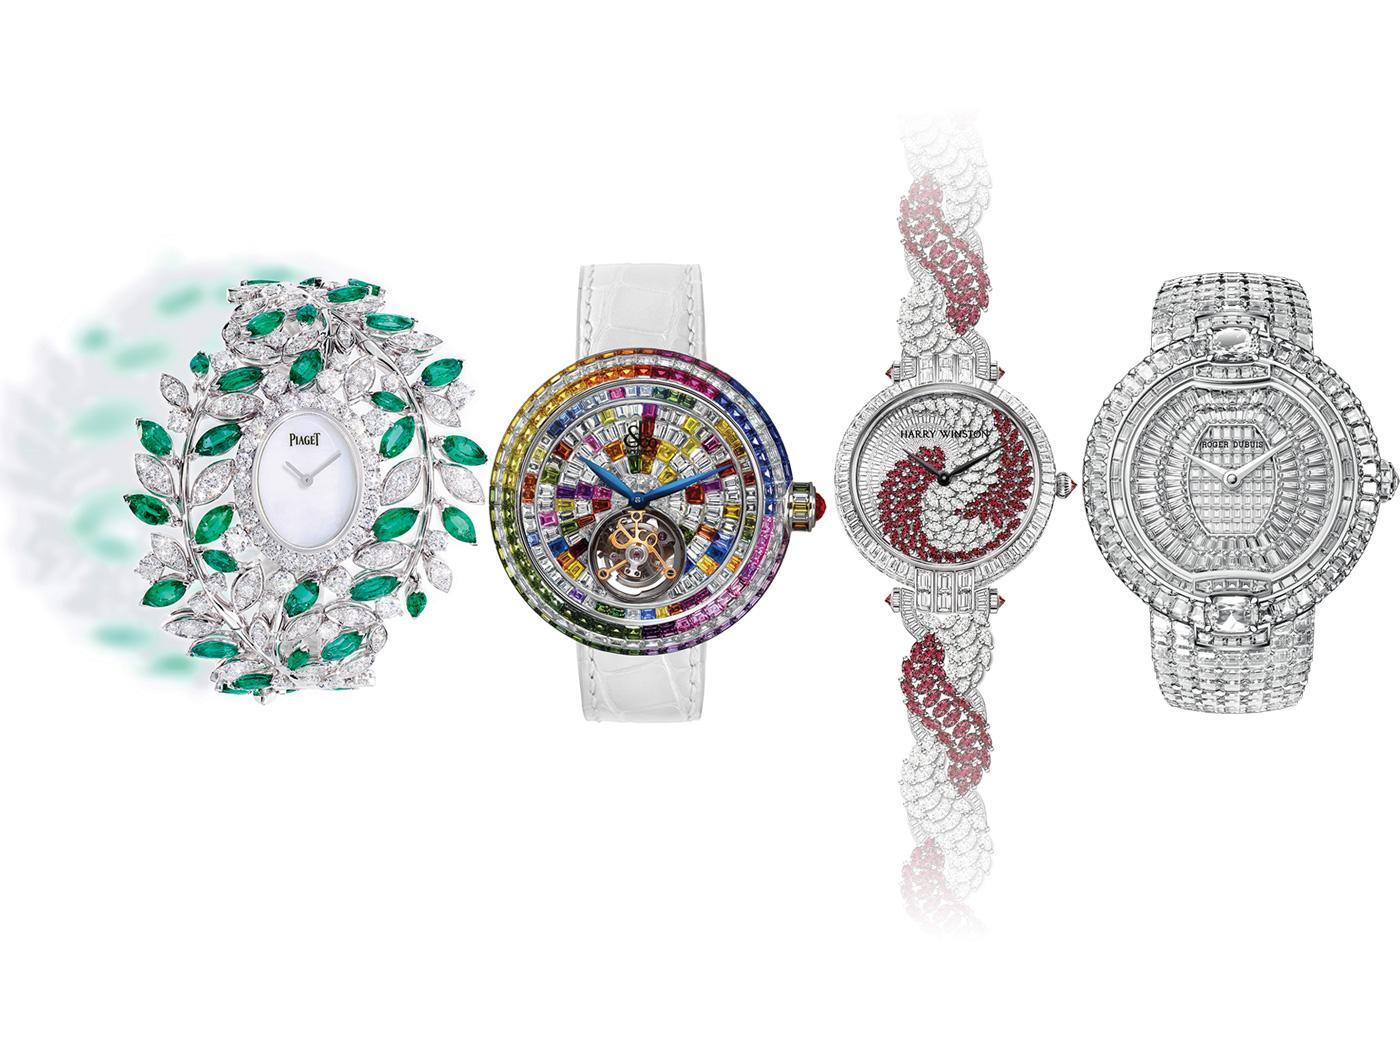 shining time - i 4 orologi dell'articolo affiancati - img di testata